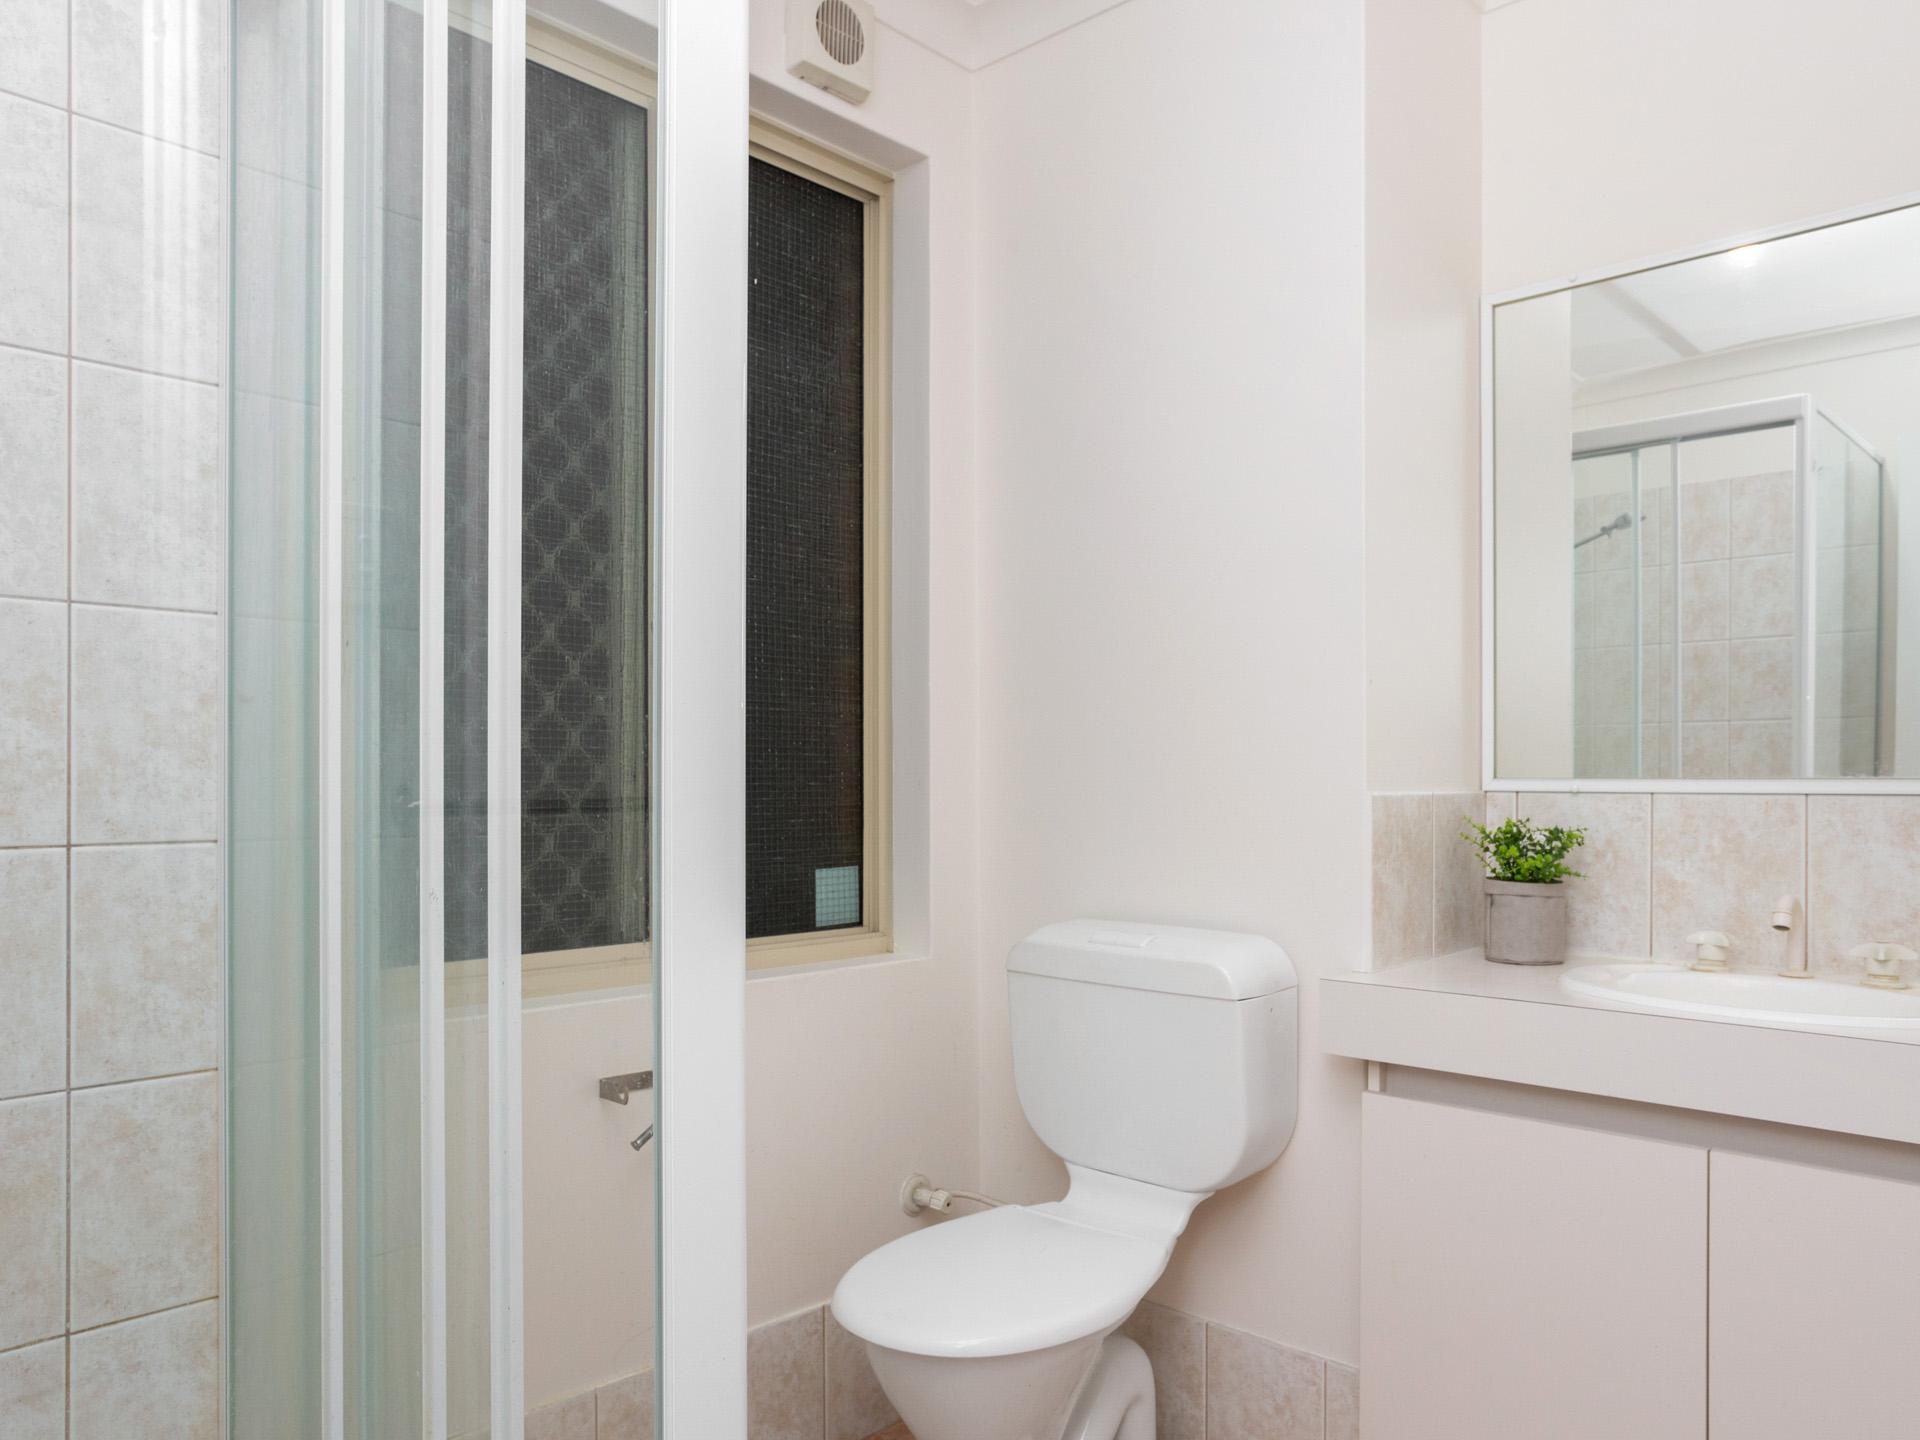 Room 1 2 3 4 5 Duncan Bath (2)